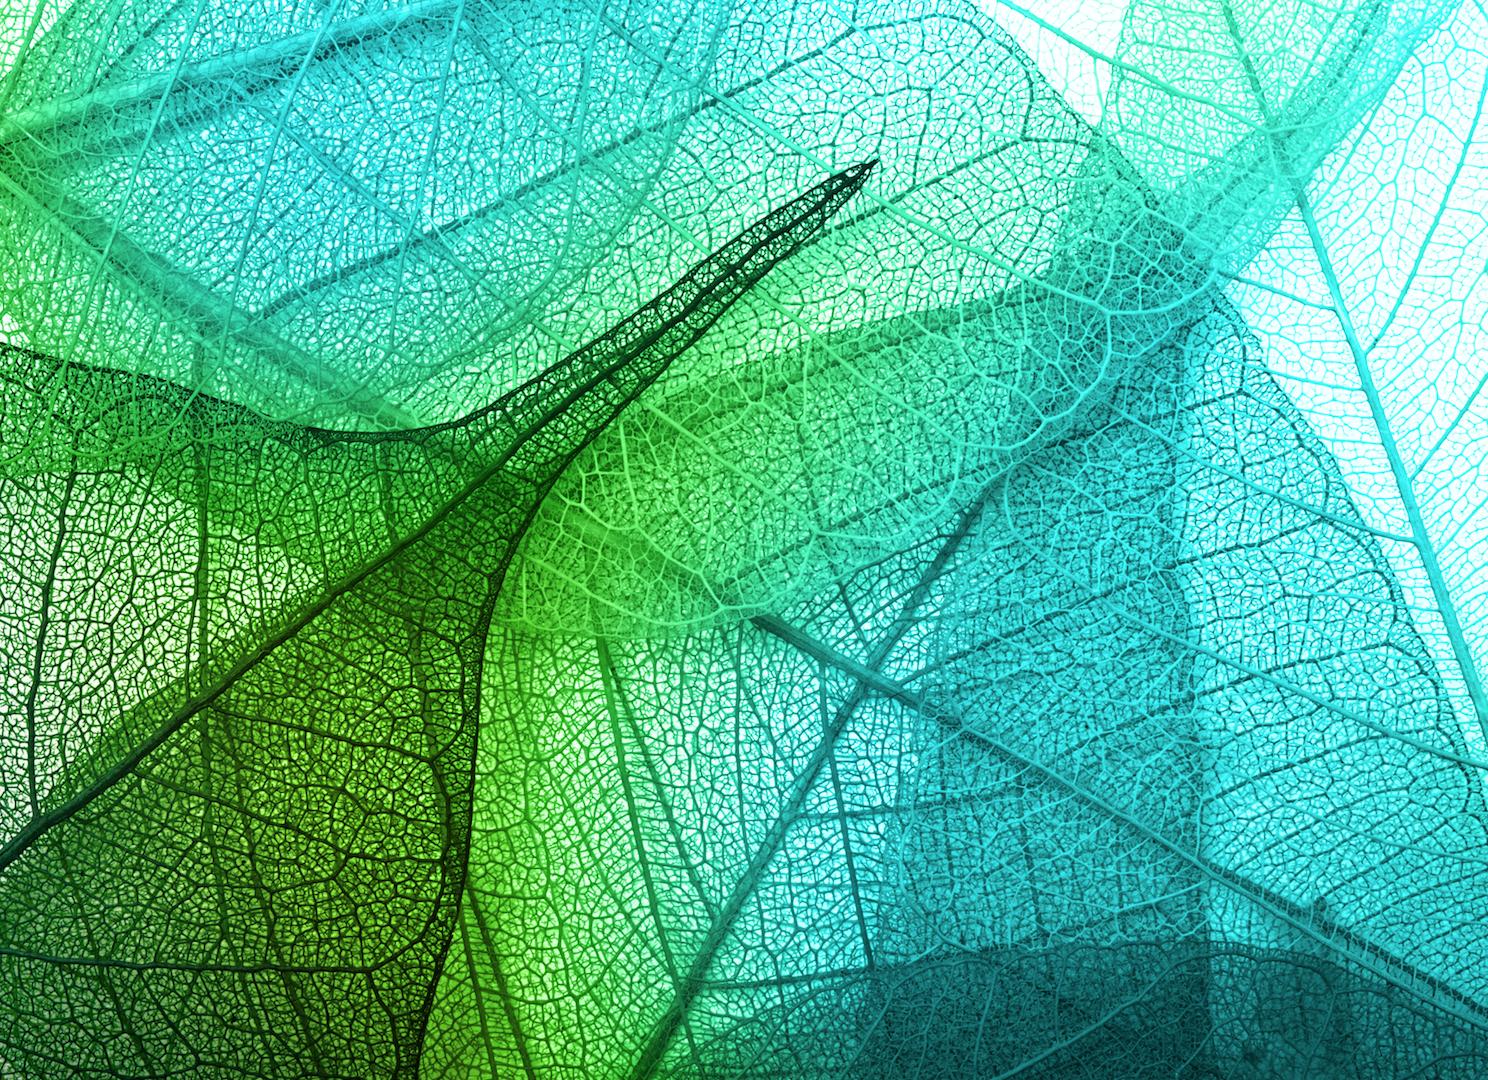 Textile Trends FallWinter 202021 Green leaf background Leaf 1488x1080